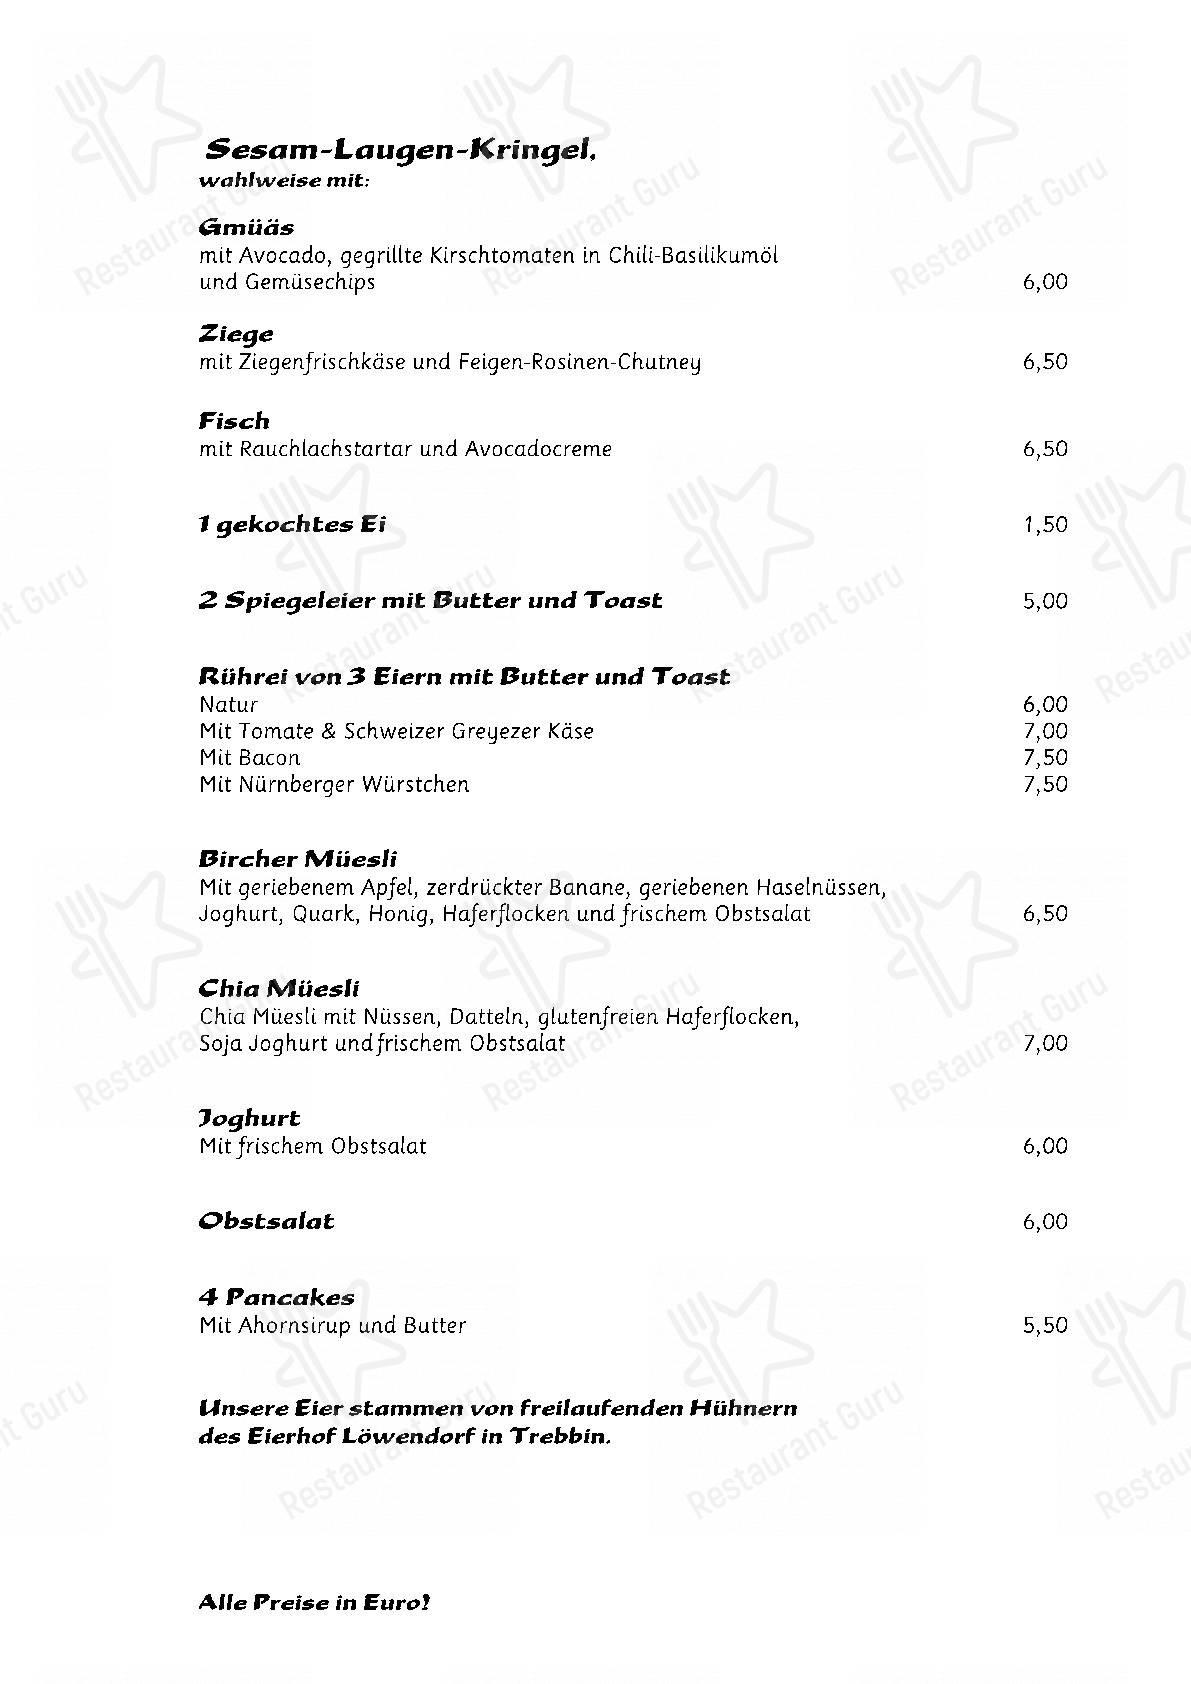 Nola's am Weinberg menu - meals and drinks